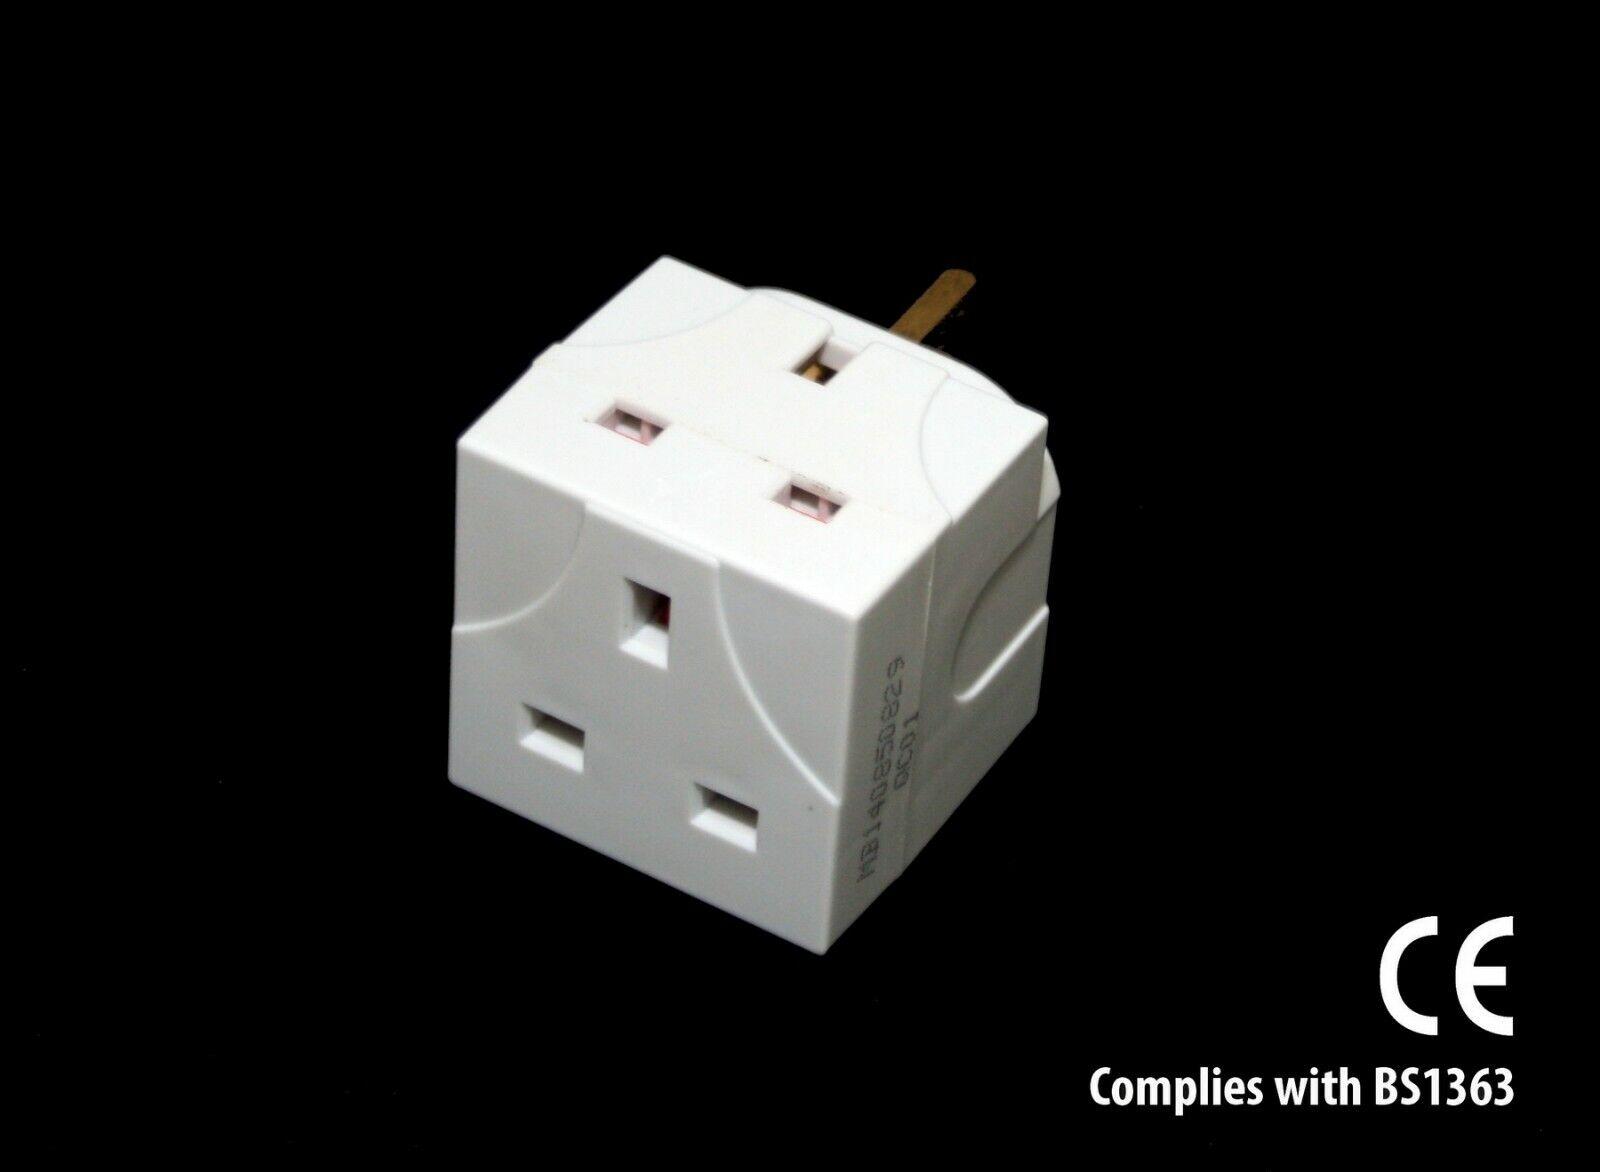 Mains Fuse Box Uk on main terminal box, main fuse house, main disconnect switch, main circuit breaker, main panel box, main breaker box, light box, main breaker panel, generator box, main circuit box, heater box, circuit breaker box, motor box, main electrical box, main fuse battery,